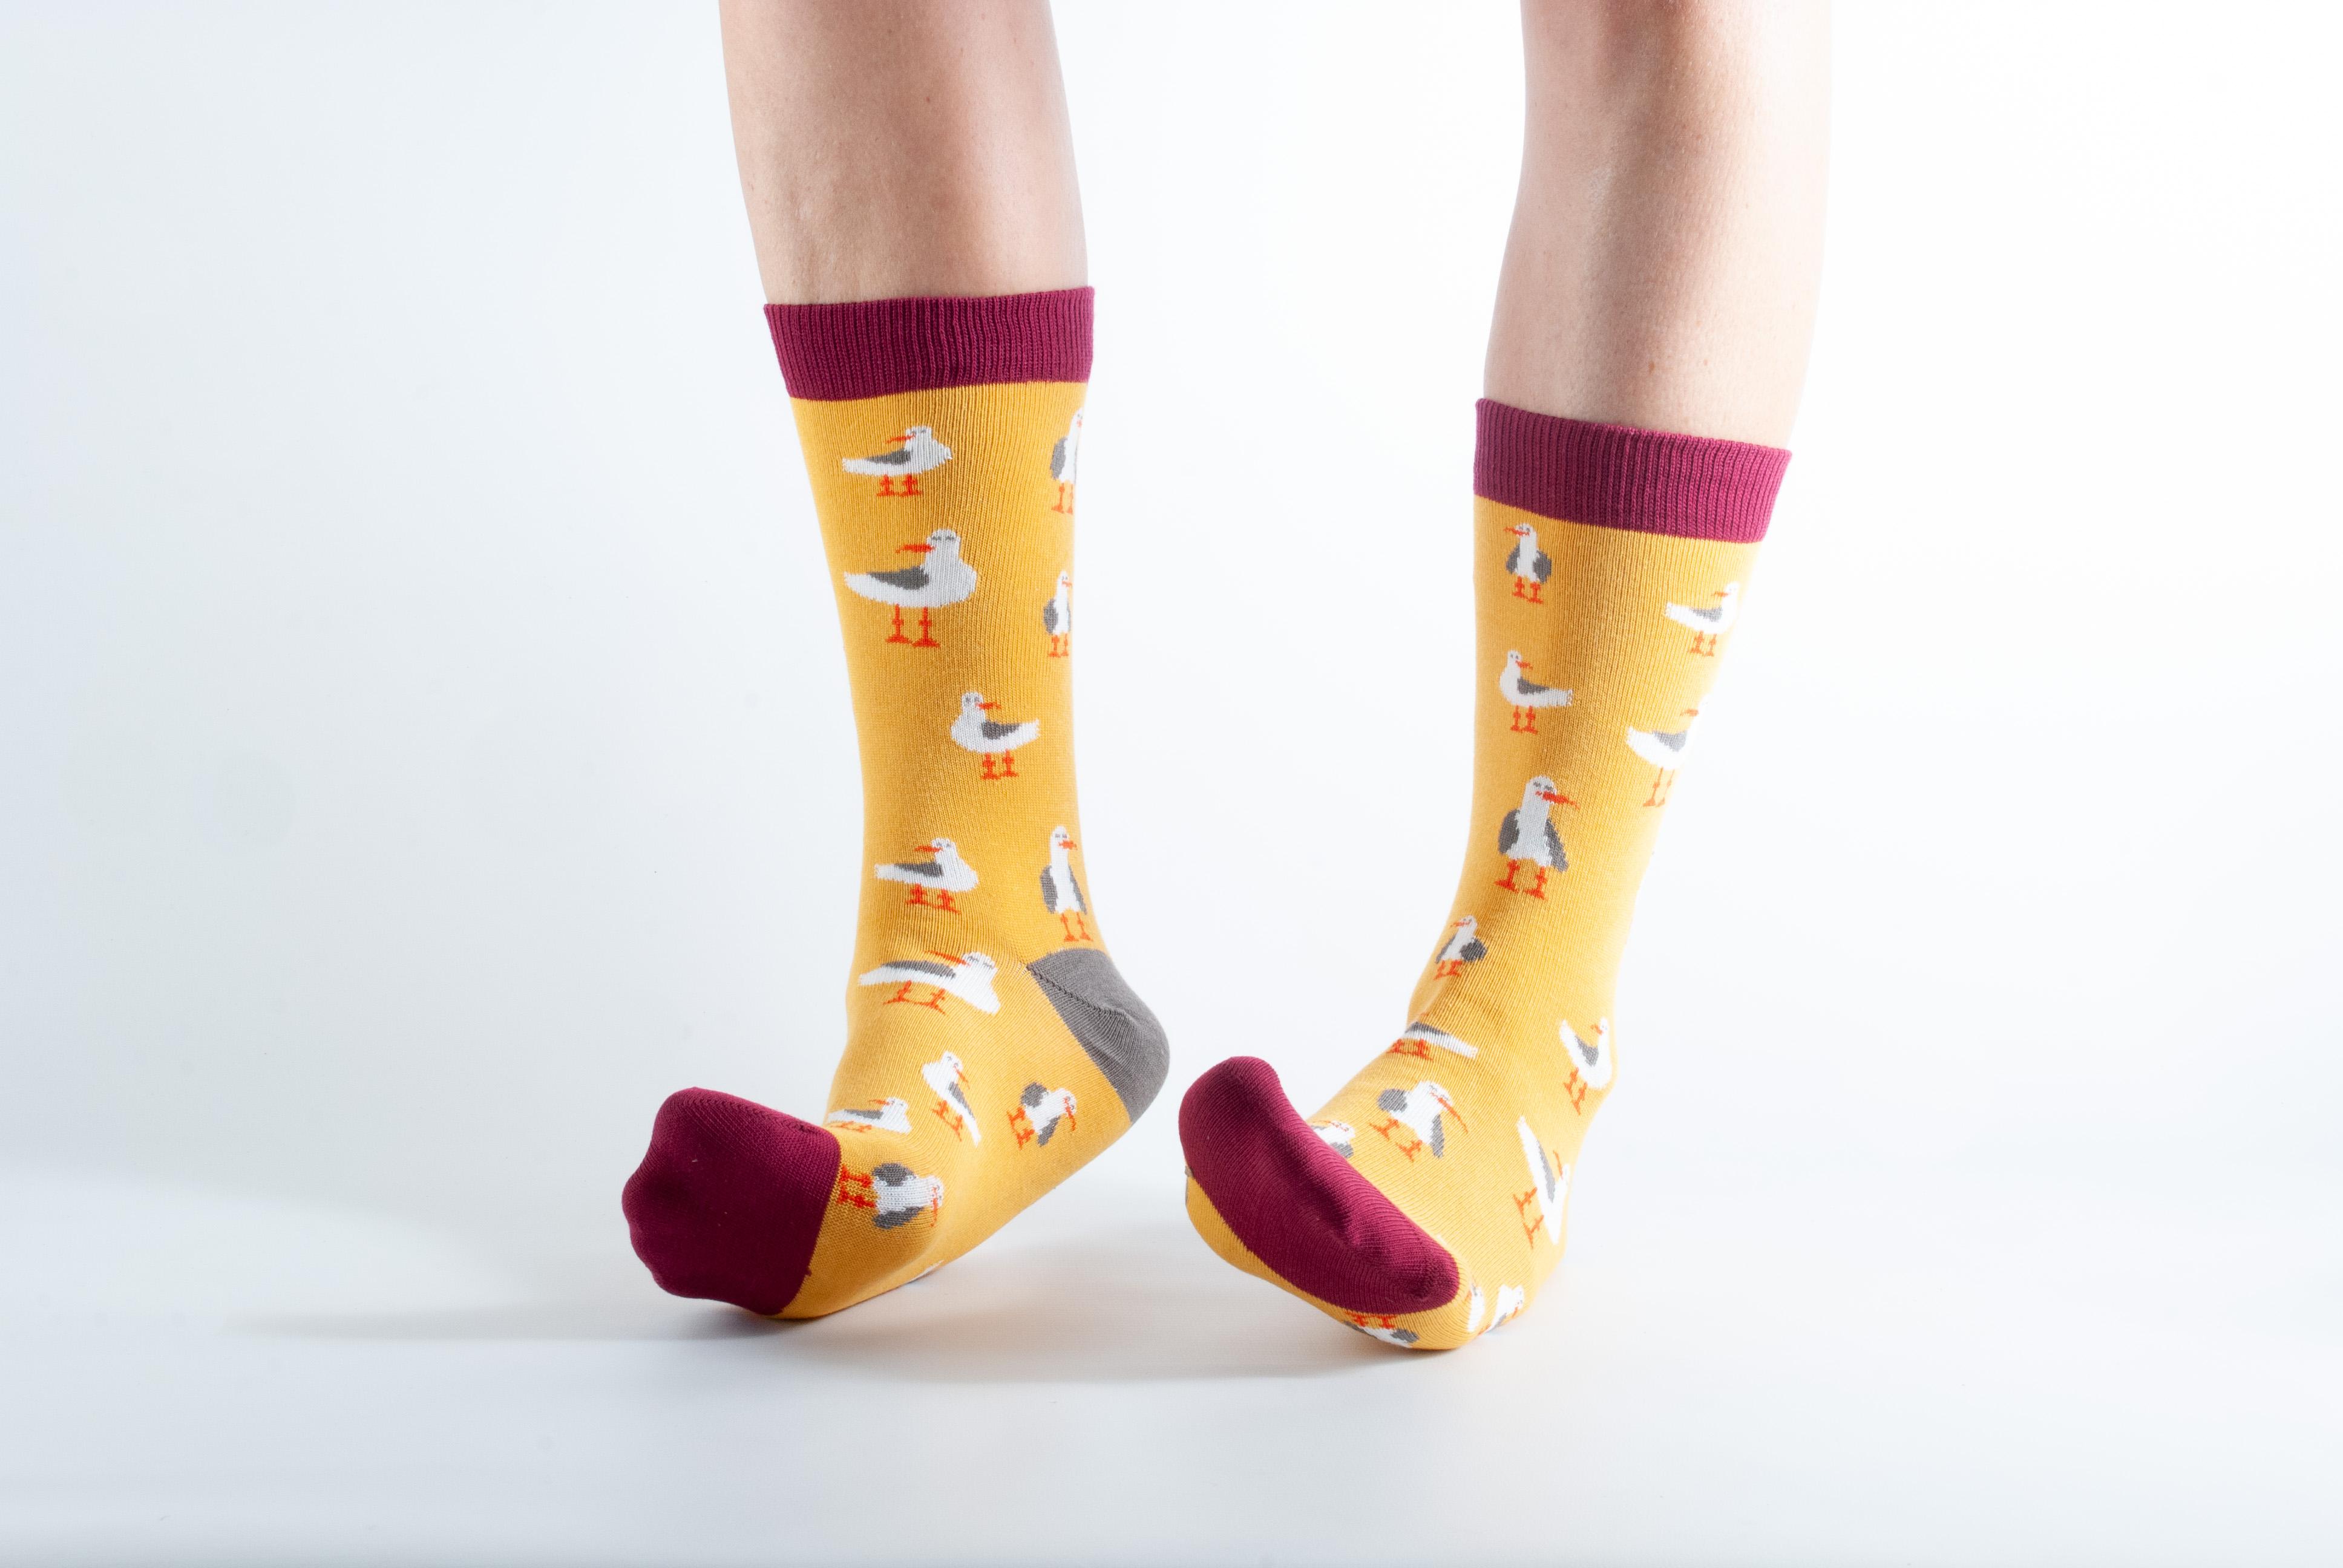 Womens Seagull bamboo socks - yellow and maroon